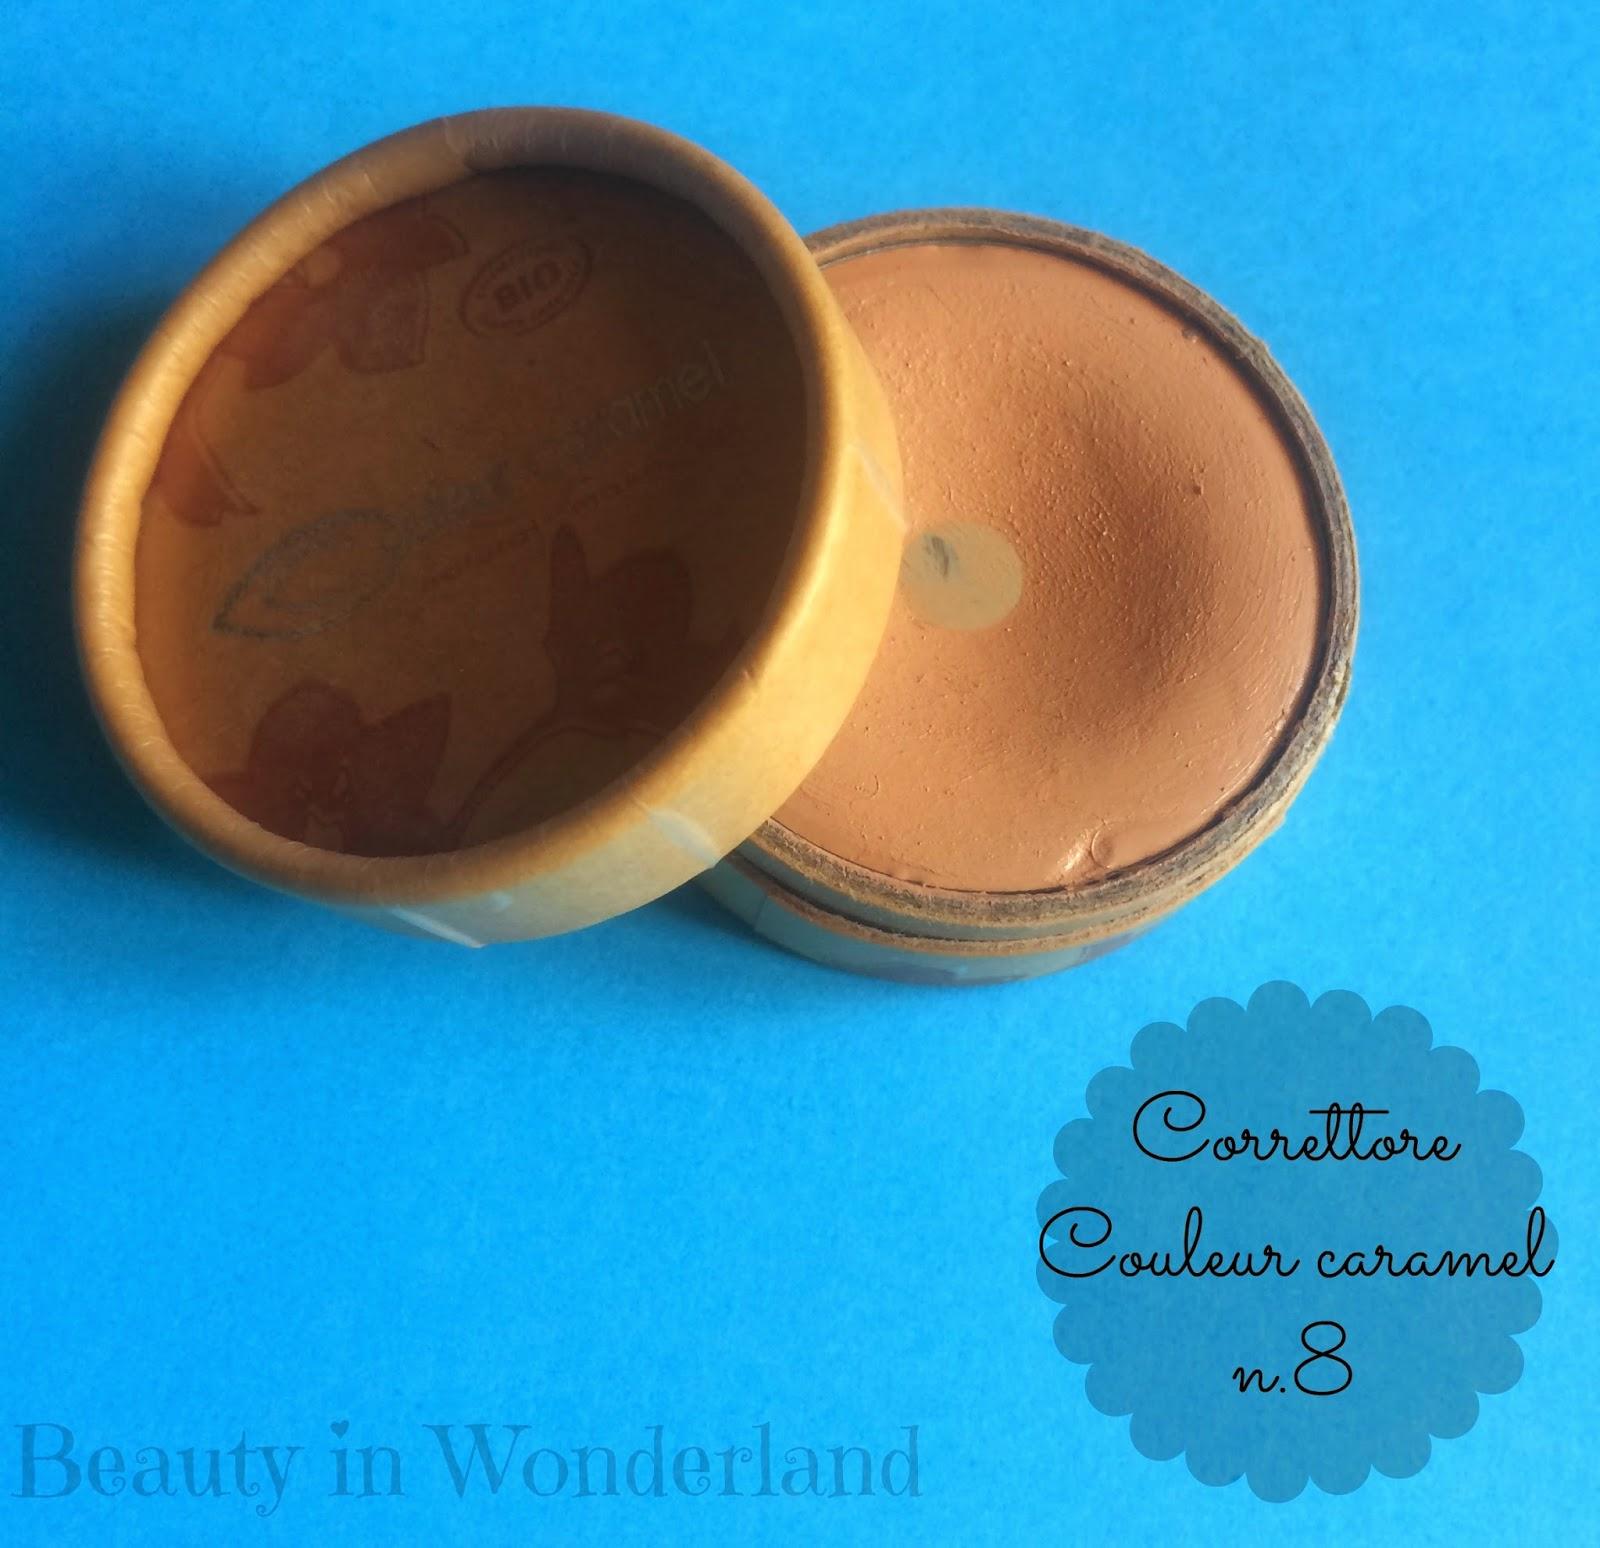 beauty in wonderland01 review correttore couleur caramel n 8 beige apricot. Black Bedroom Furniture Sets. Home Design Ideas